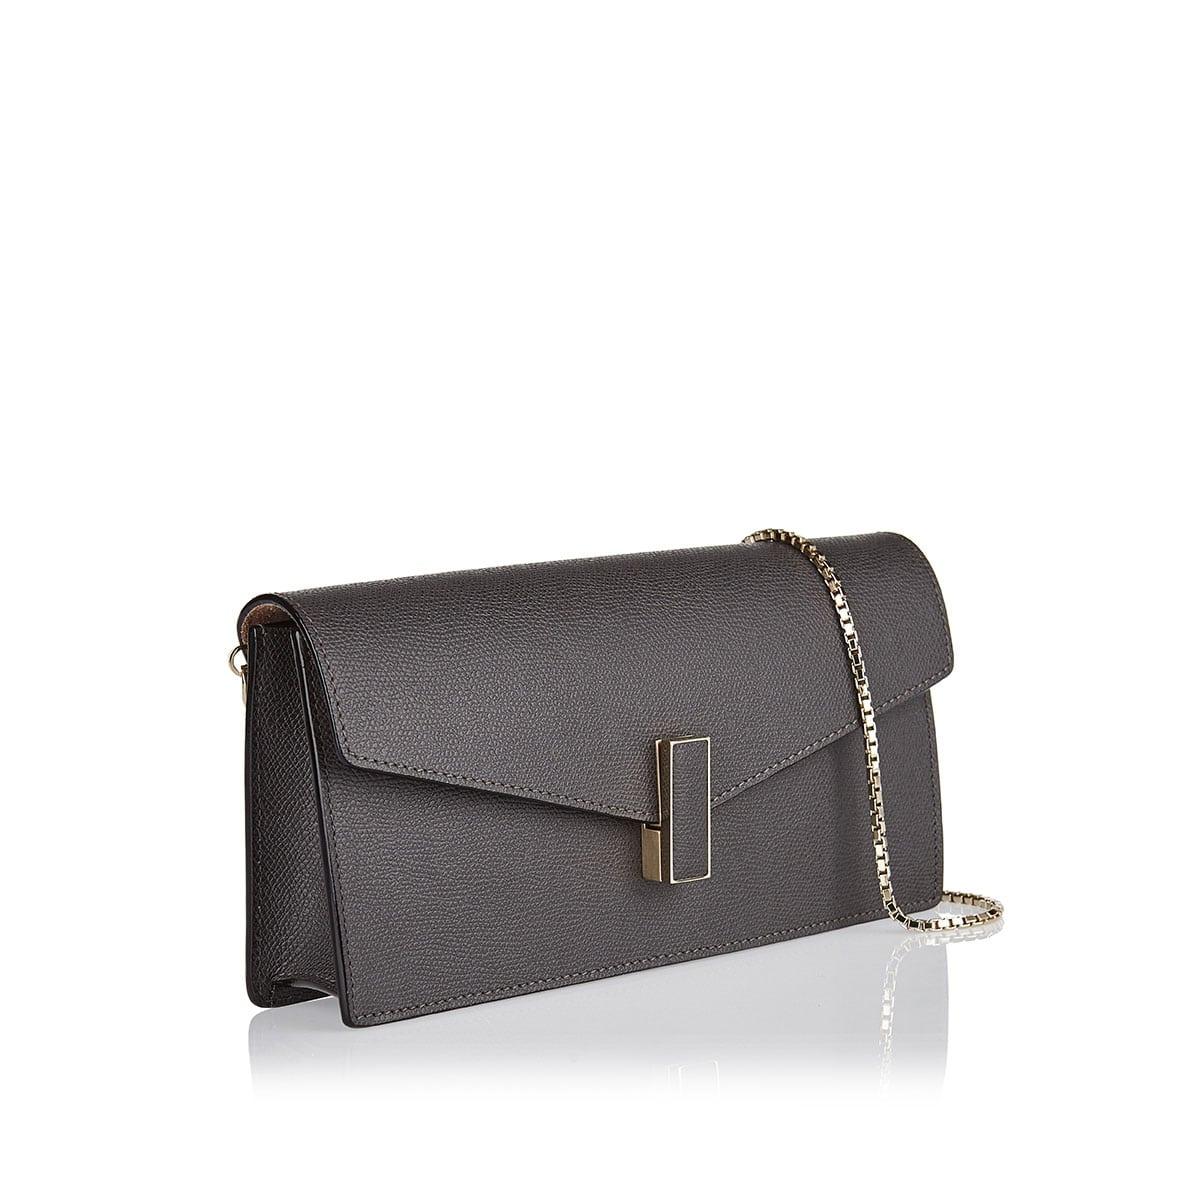 Iside Gioiello leather clutch bag